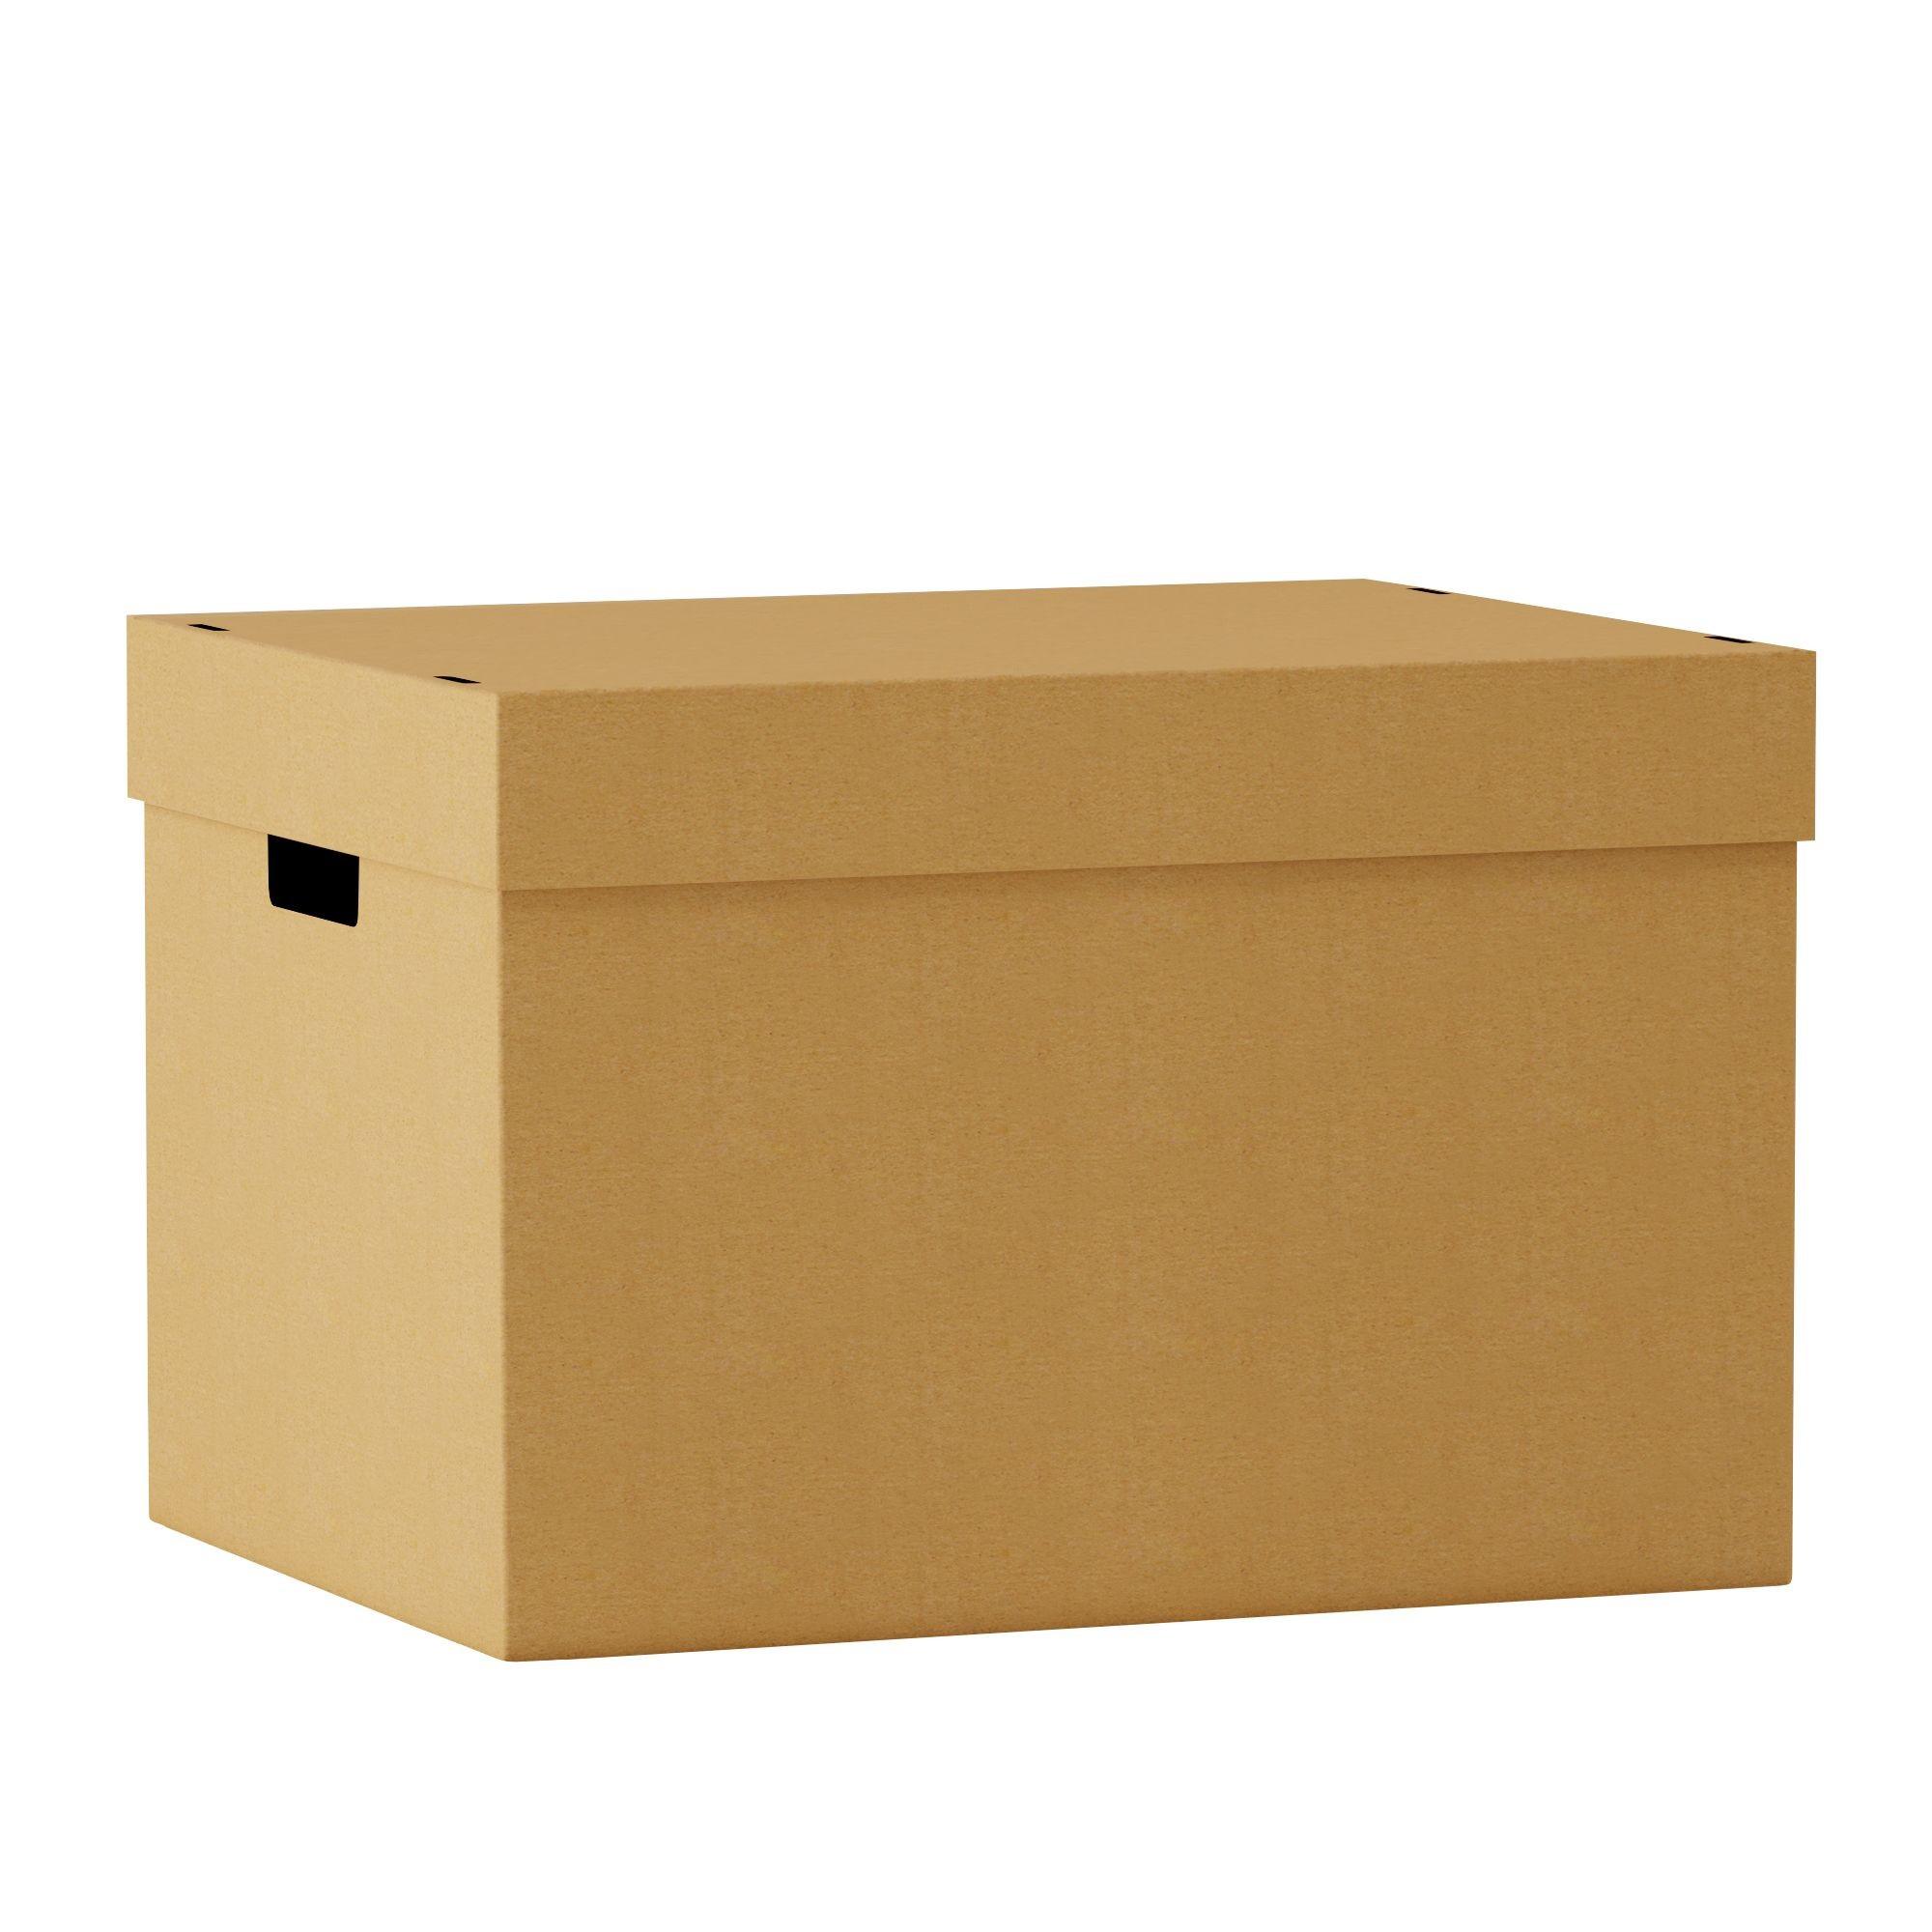 "TOTALPACK® 15 x 12 x 10"" Corrugated File Box 1 Unit"